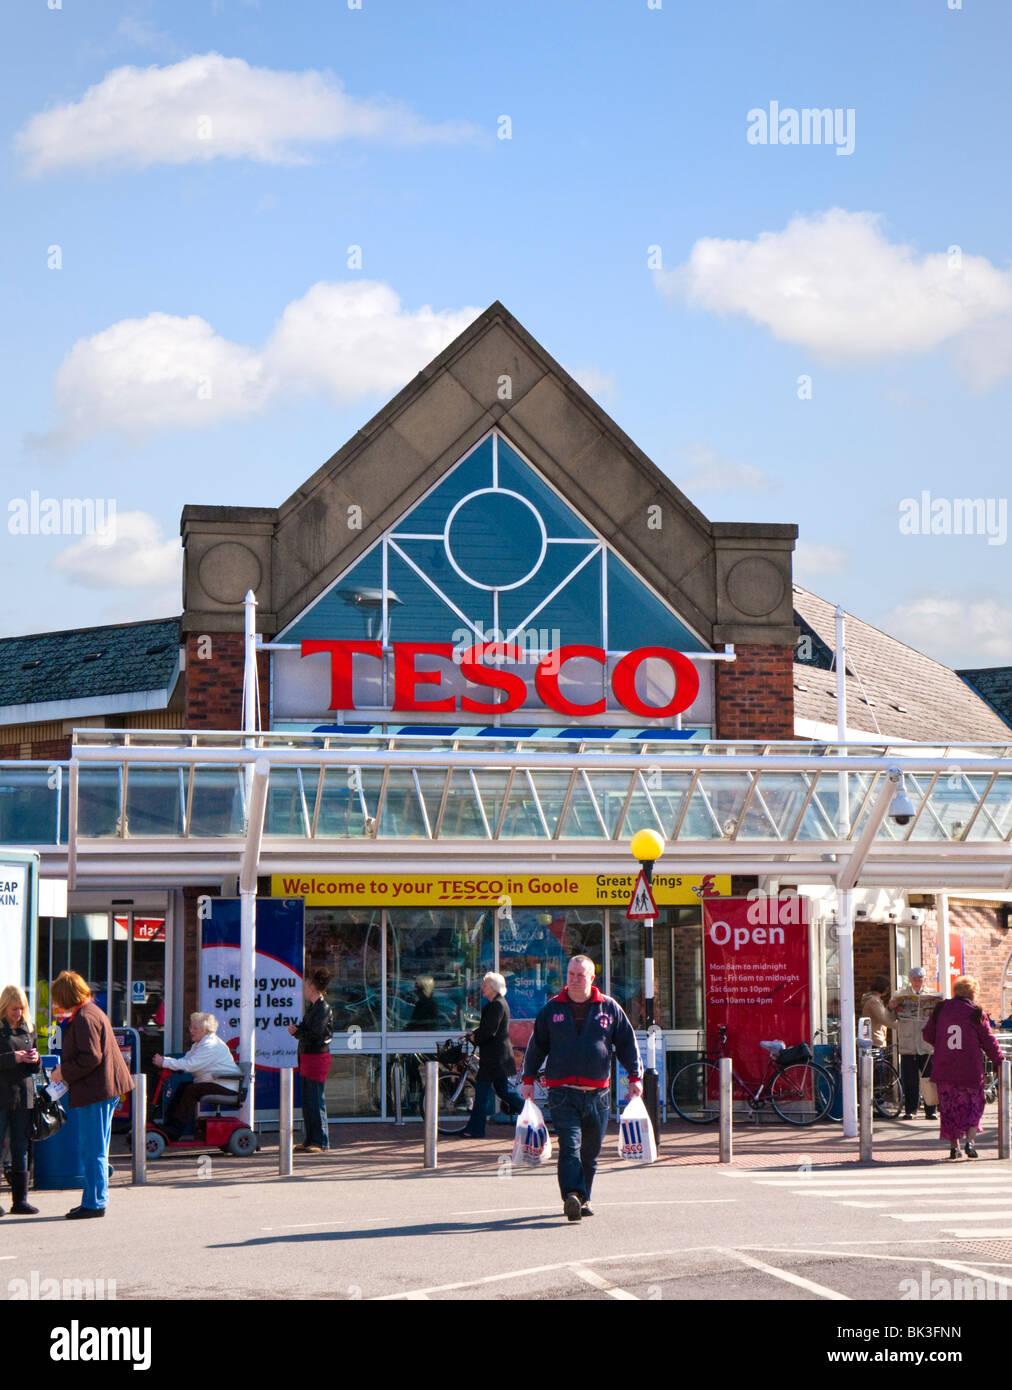 Tesco supermarket store, England, UKStock Photo